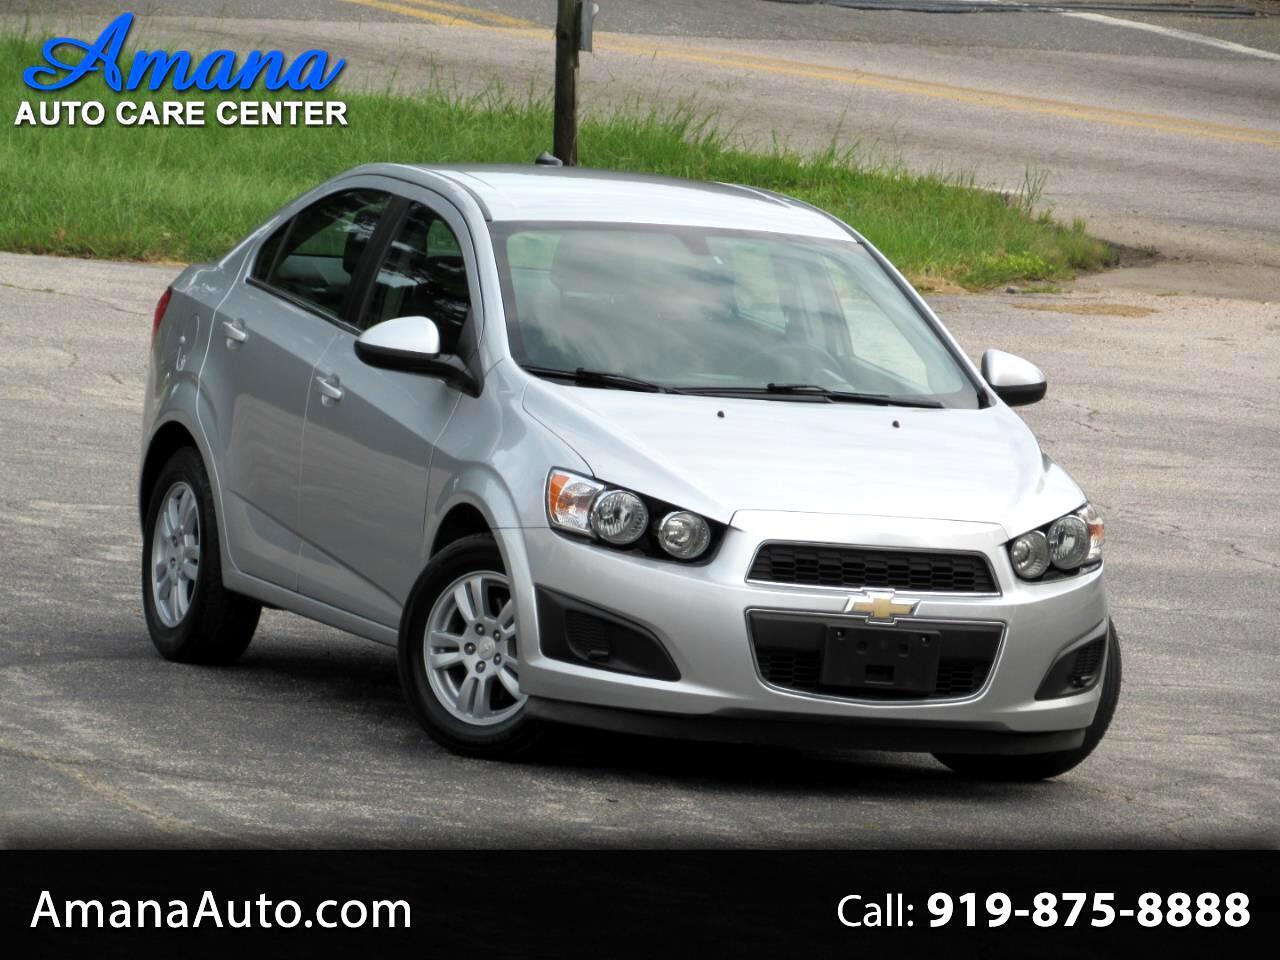 Chevrolet Sonic 4dr Sdn Auto LT 2014